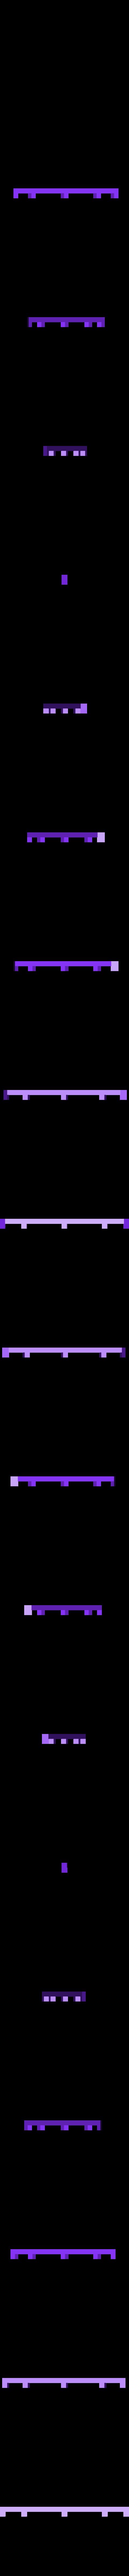 G traverse1 sous ridelle.STL Download STL file Draisine Matisa for LGB • 3D printable object, biddle